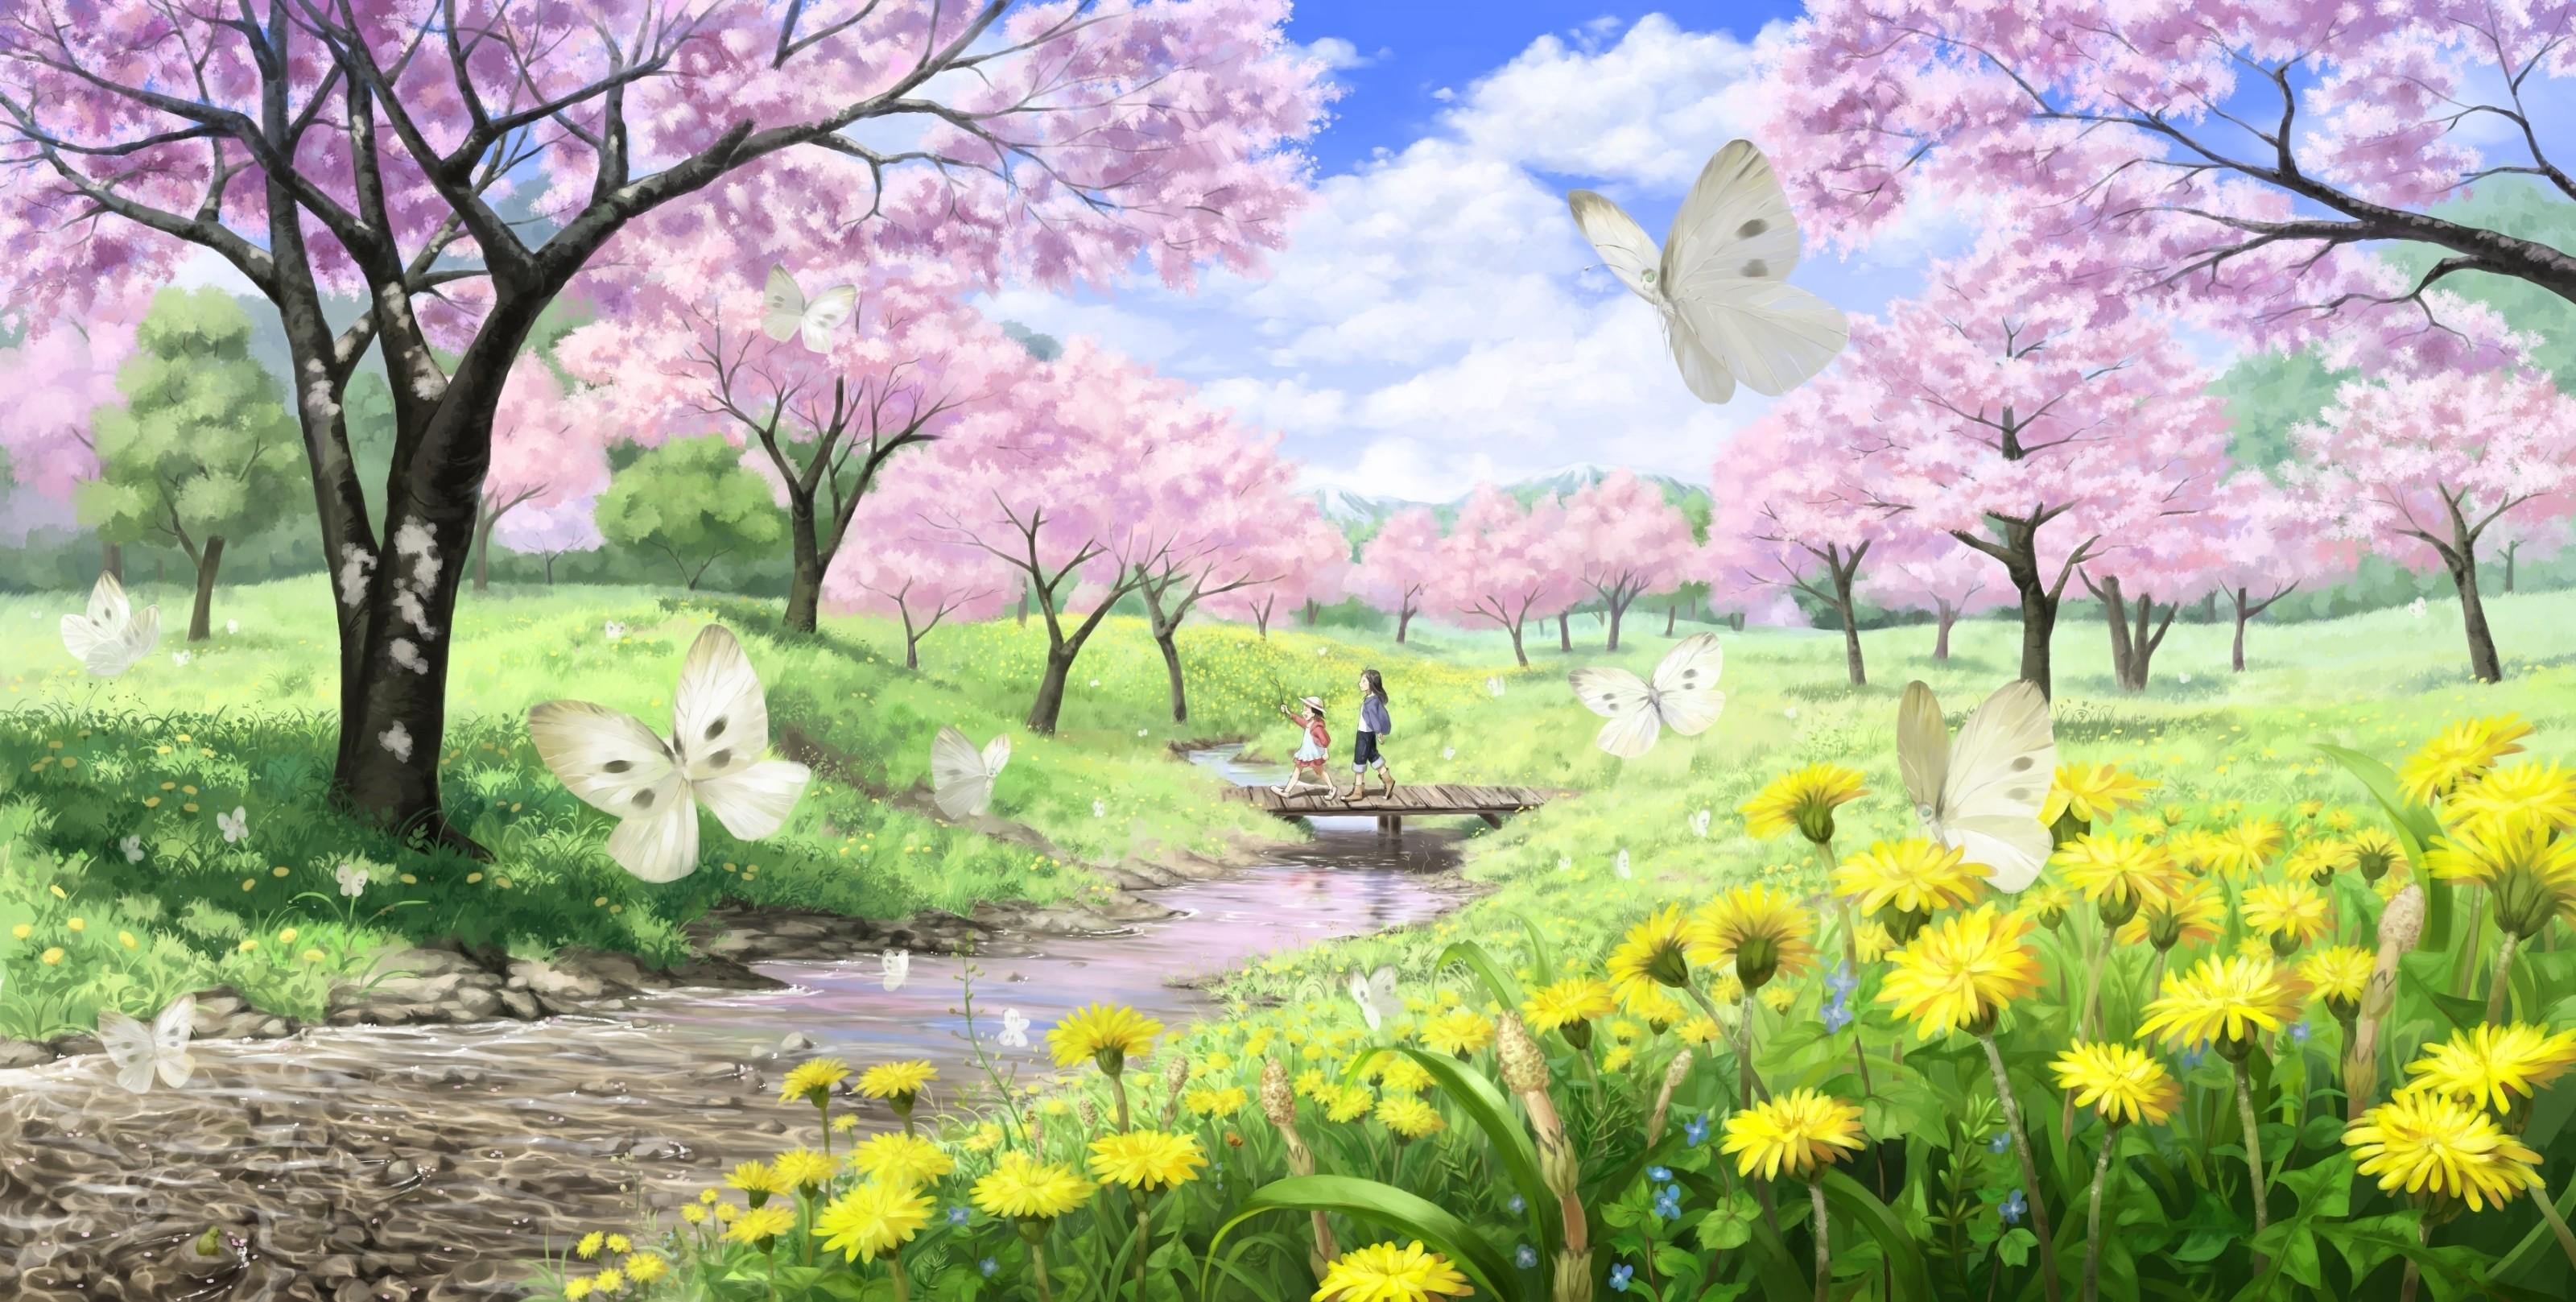 Sfondi desktop primavera 50 immagini for Immagini gratis per desktop primavera